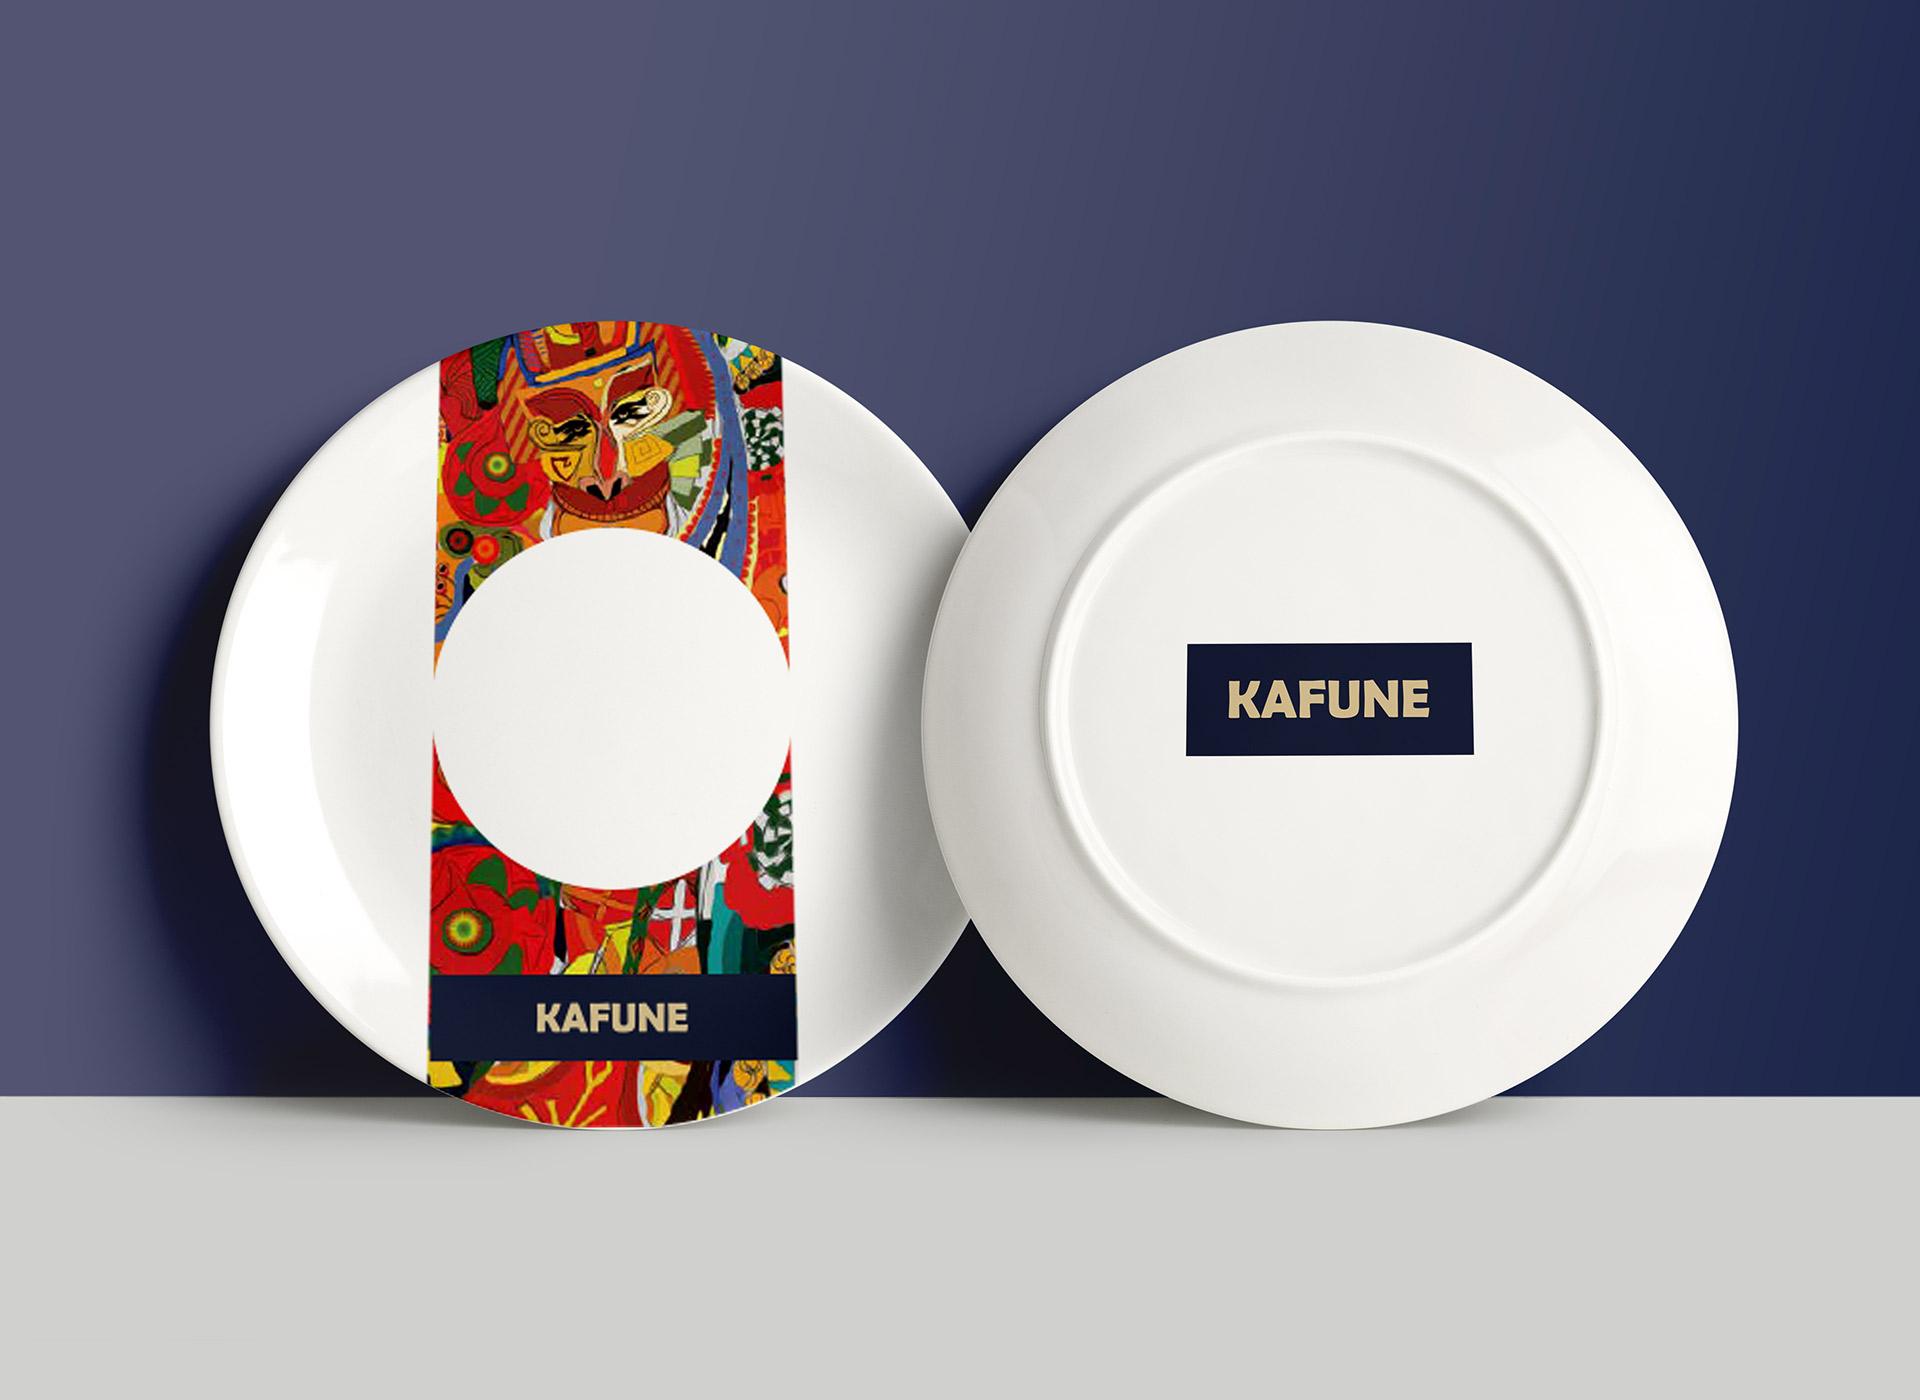 kafune portfolio inoveo plate